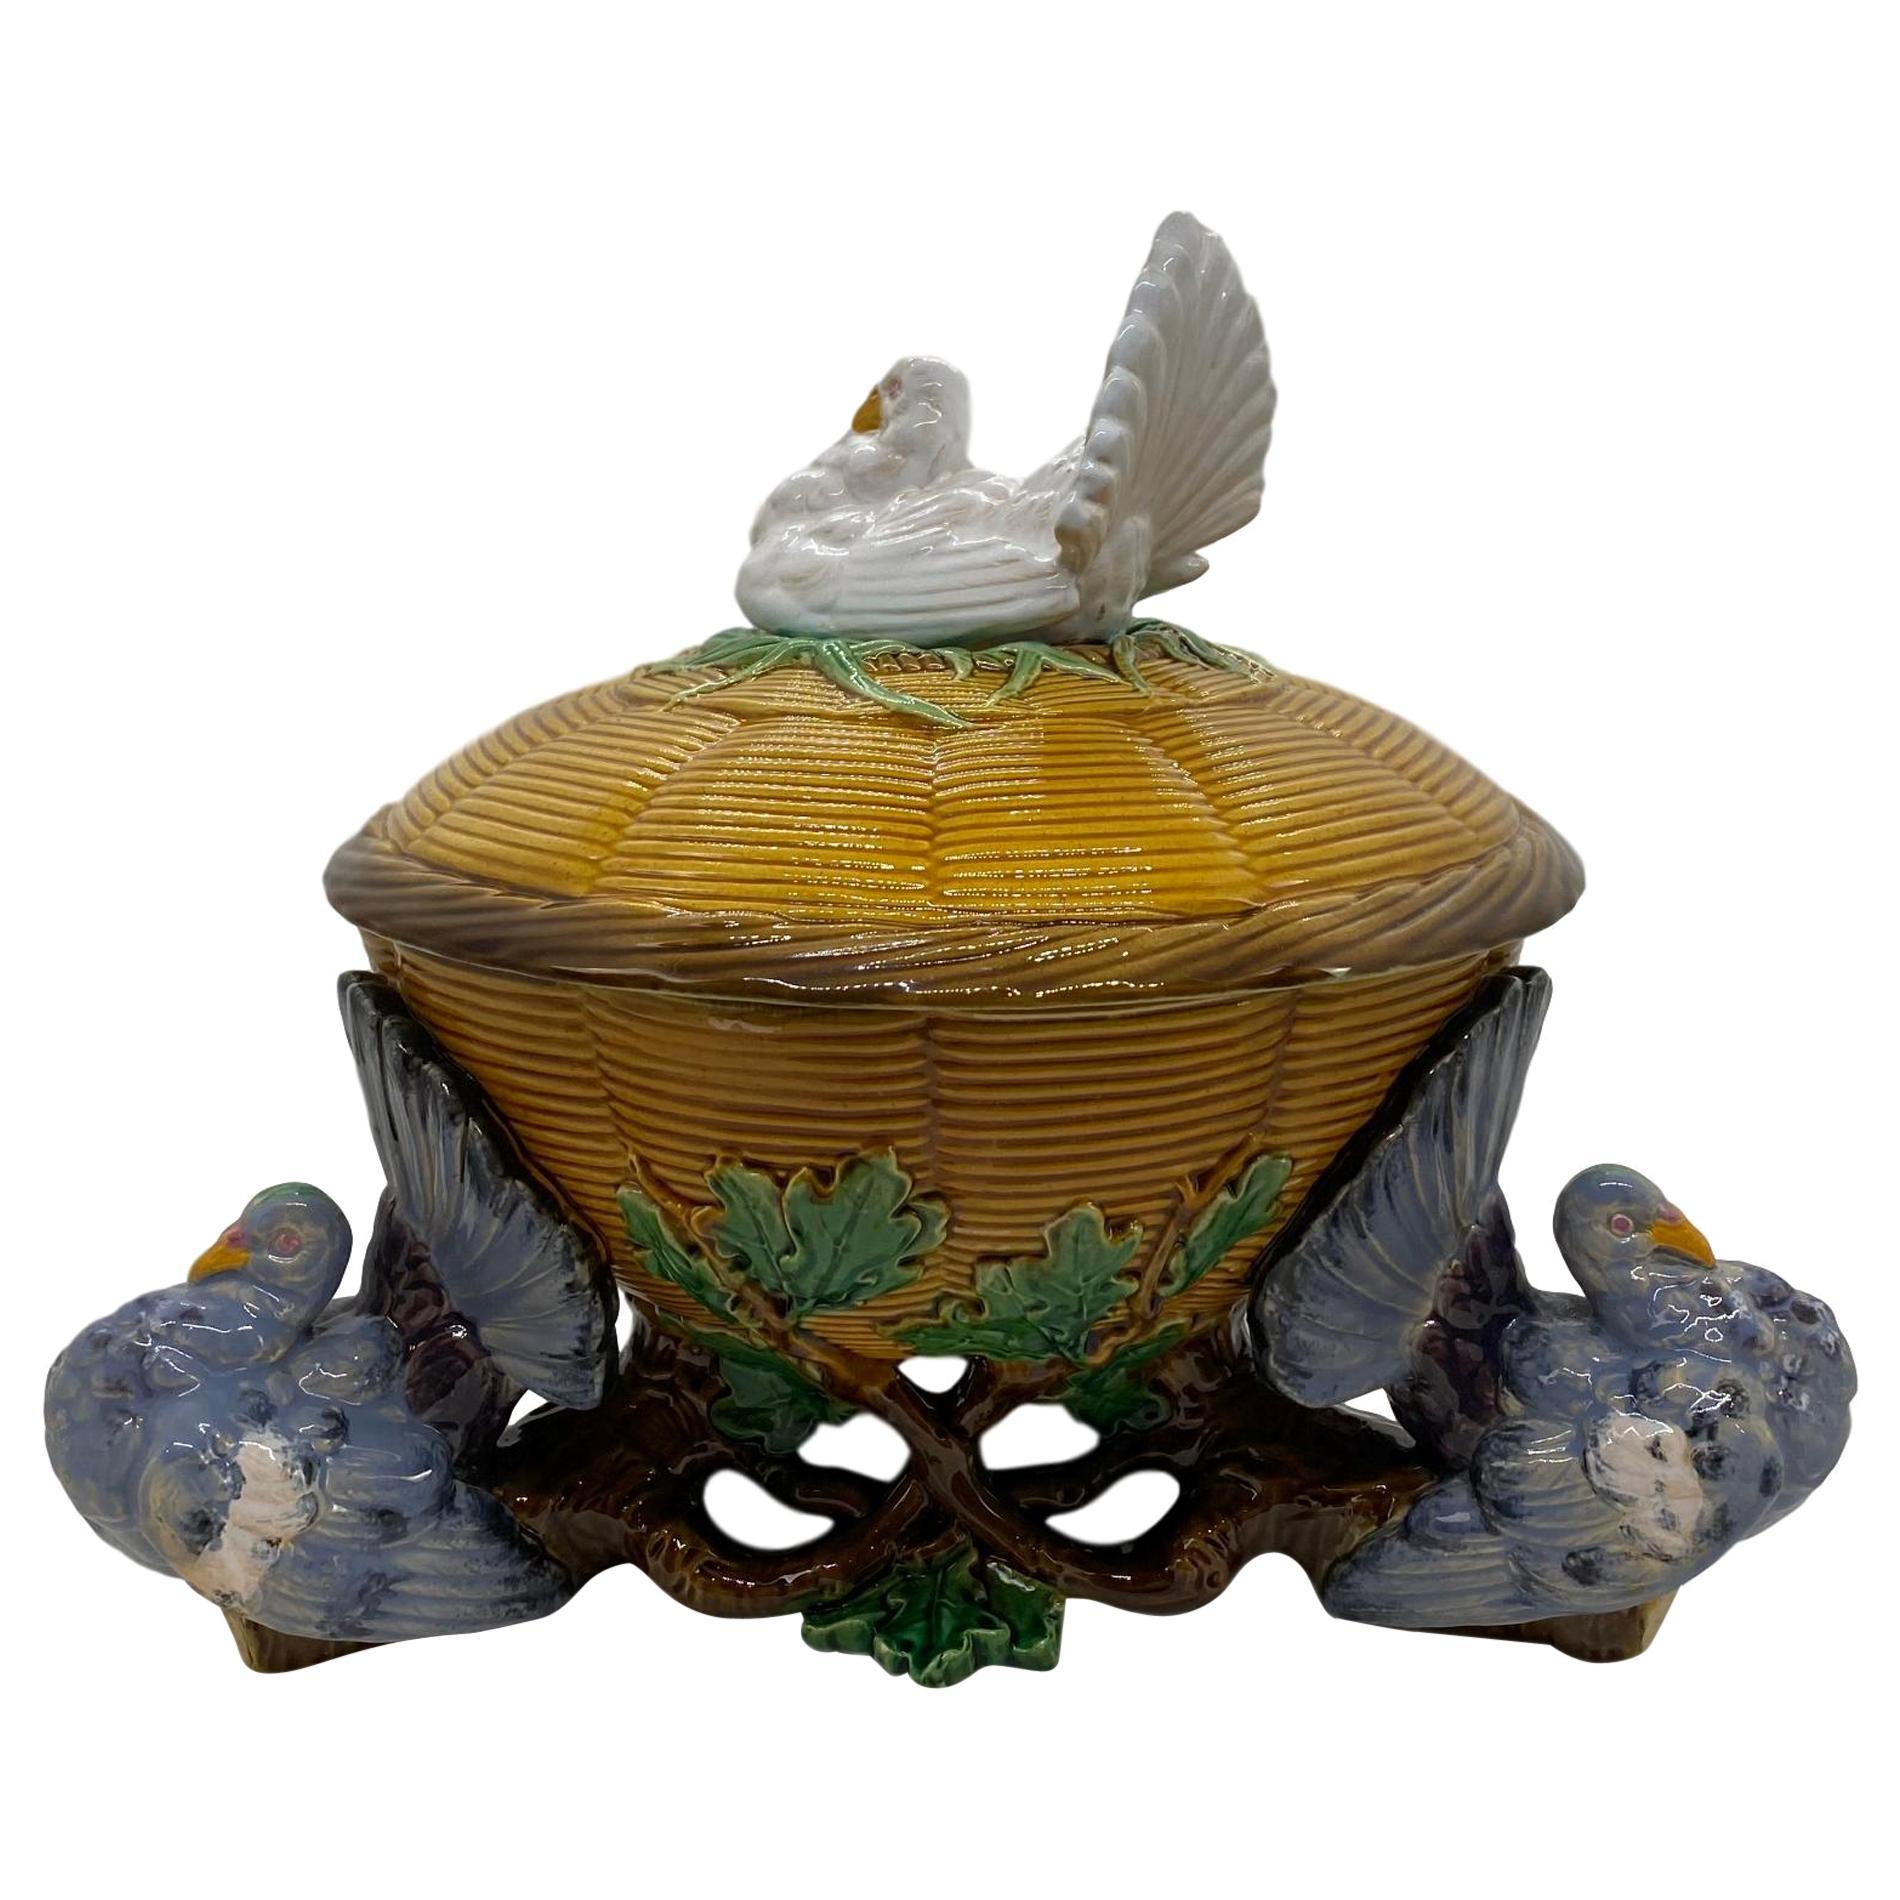 Minton Majolica White Fantail Pigeon Tureen Yellow Wicker and Oak Tree Base